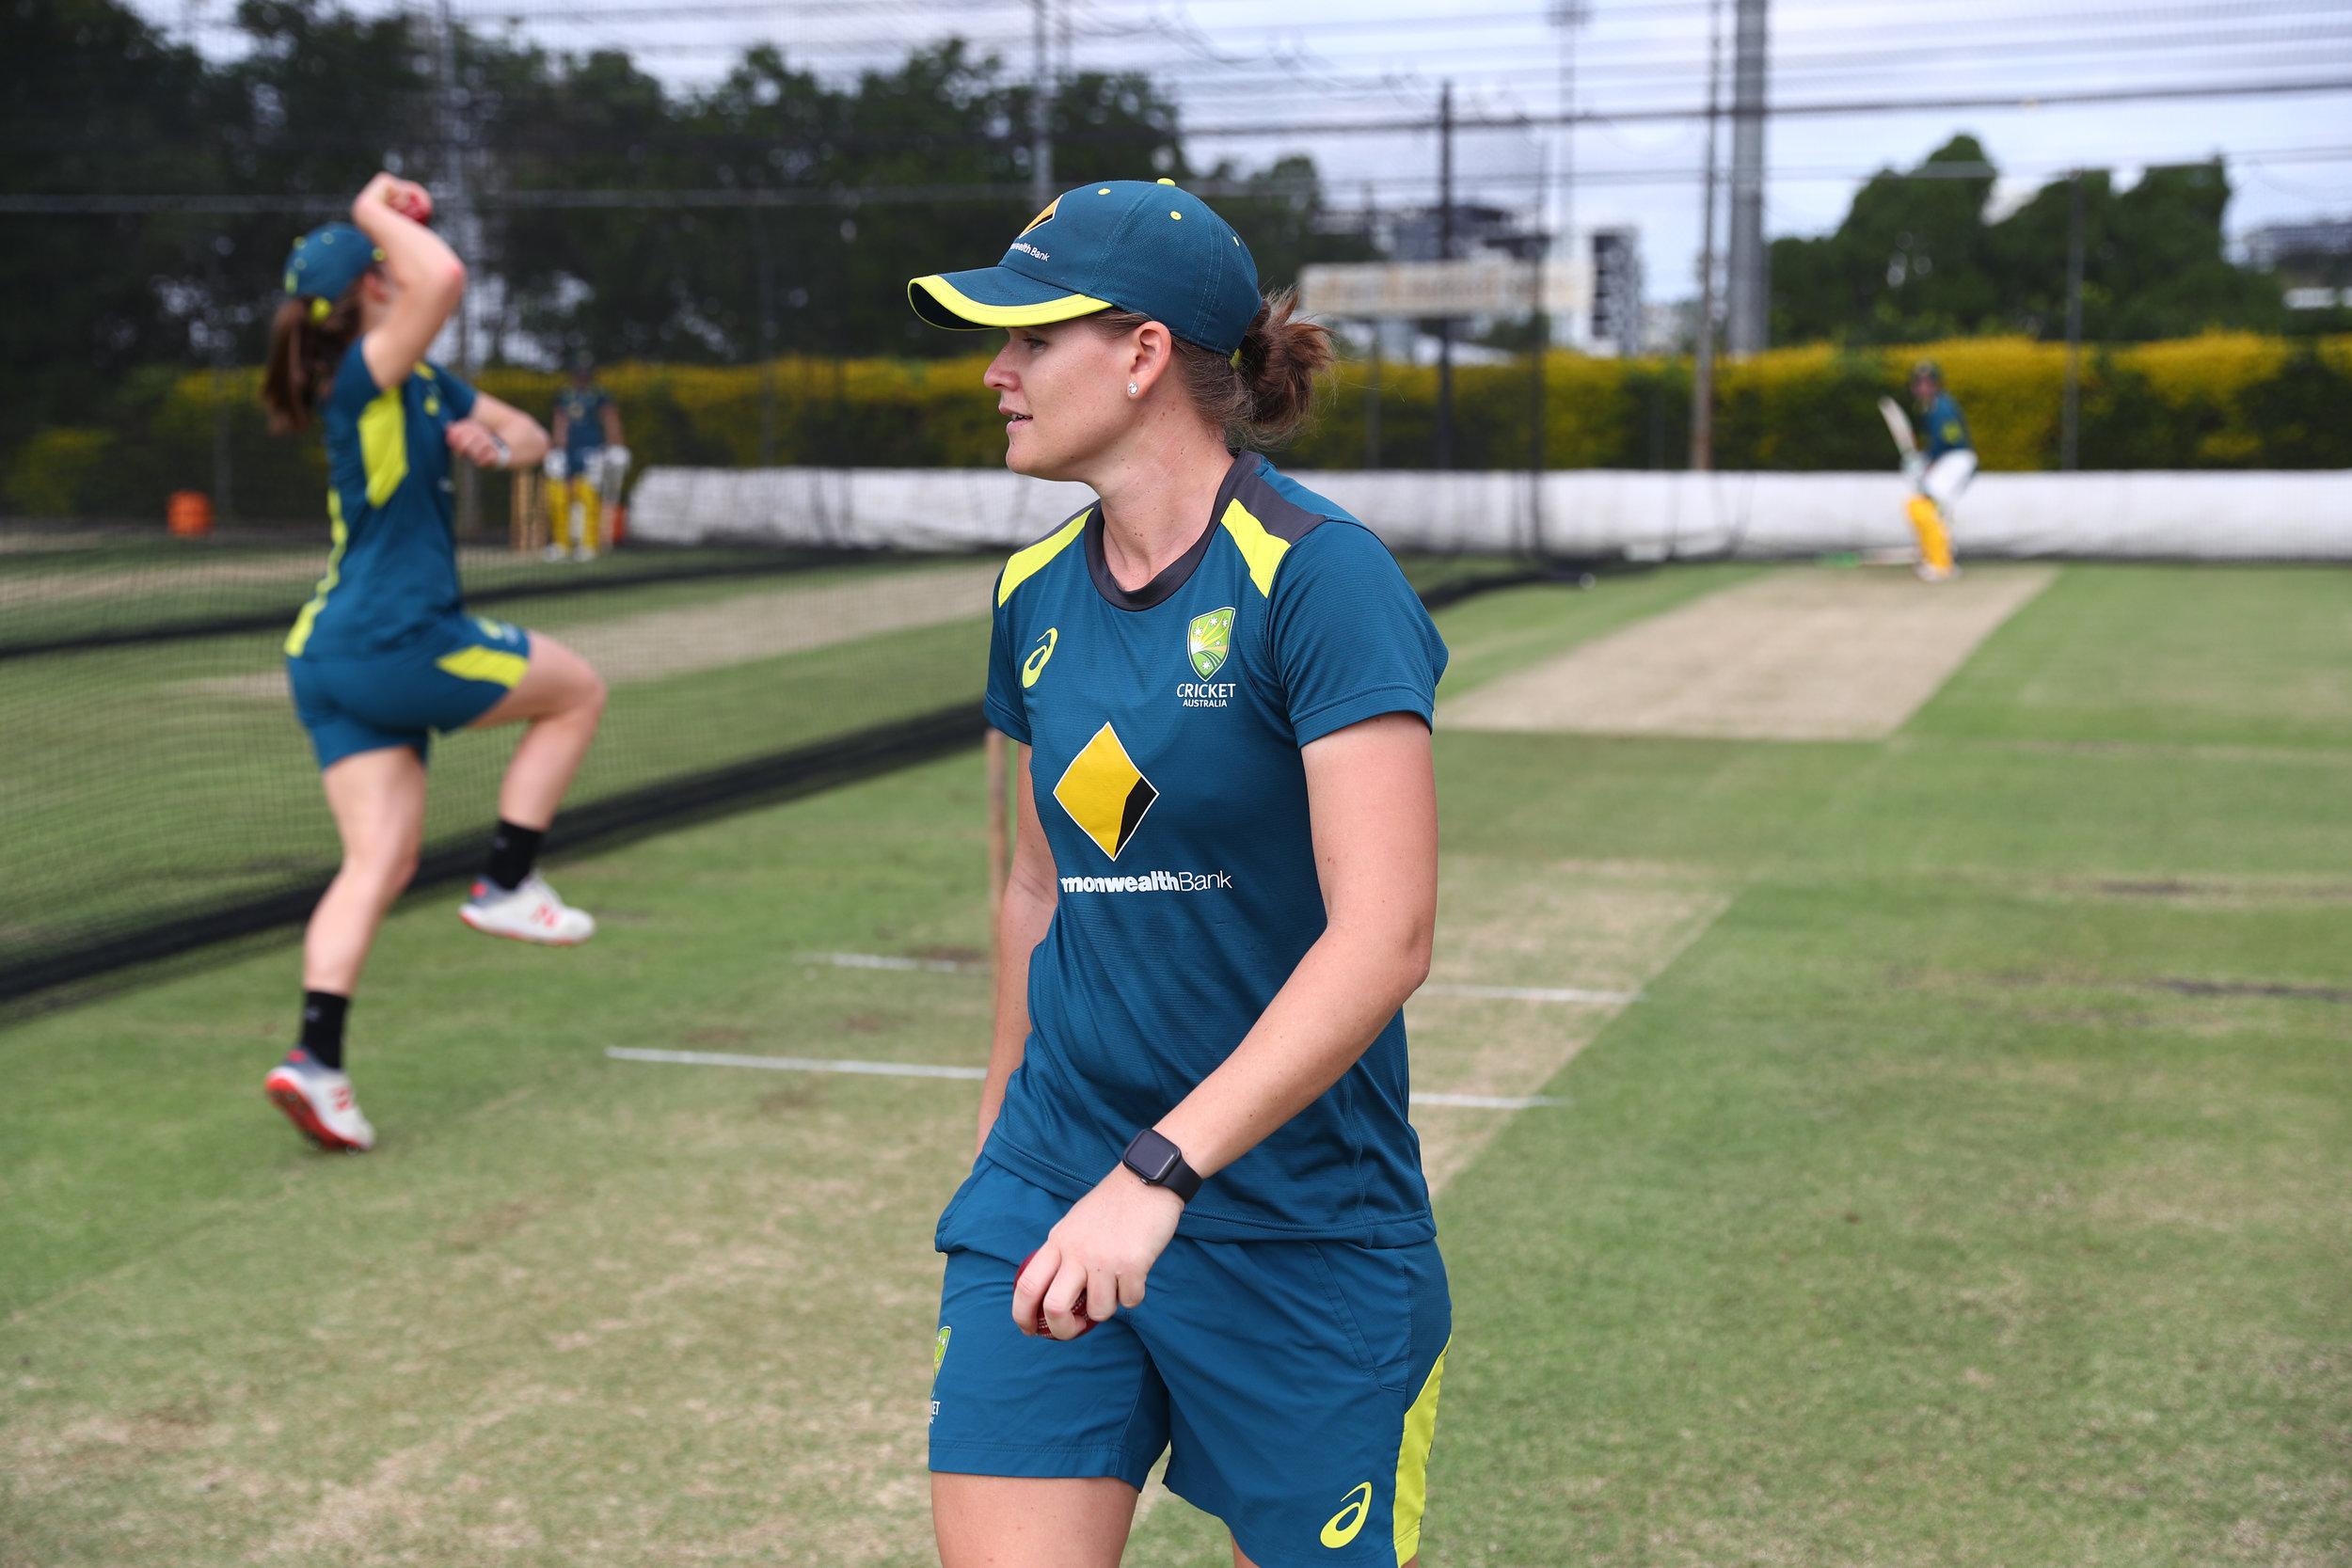 Australia-womens-cricket-team-uses-Apple-Watch-cricket-players-062319.jpg